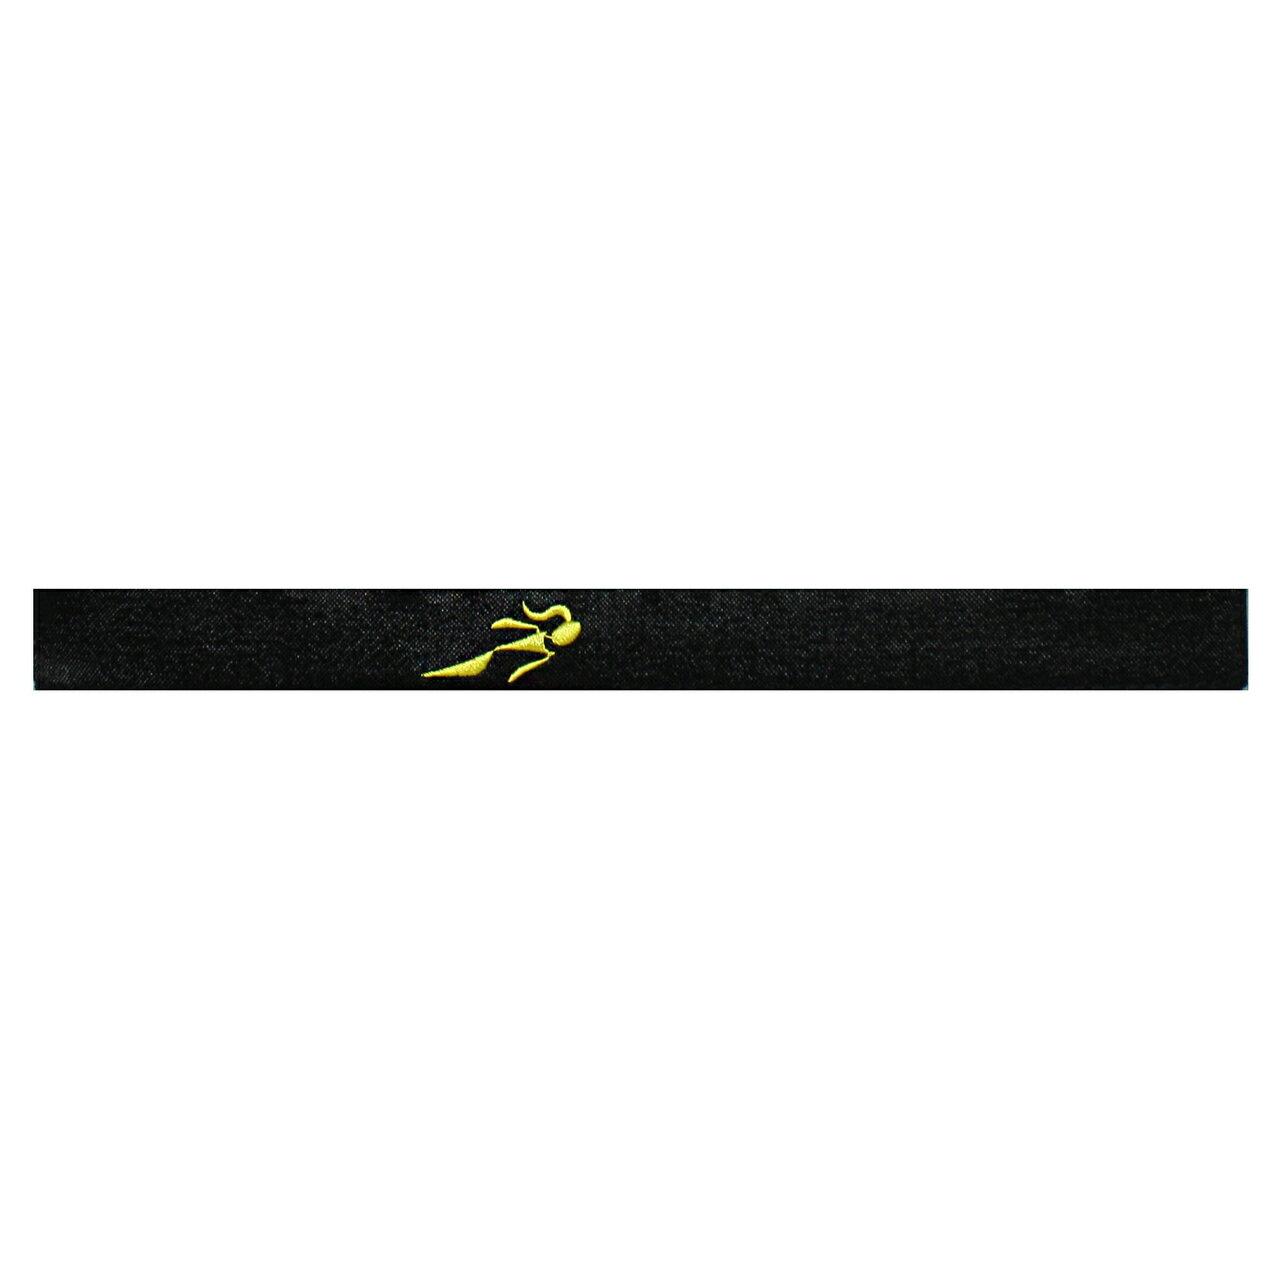 HEADSWEATS 汗淂 運動精品 髮帶(黑色)